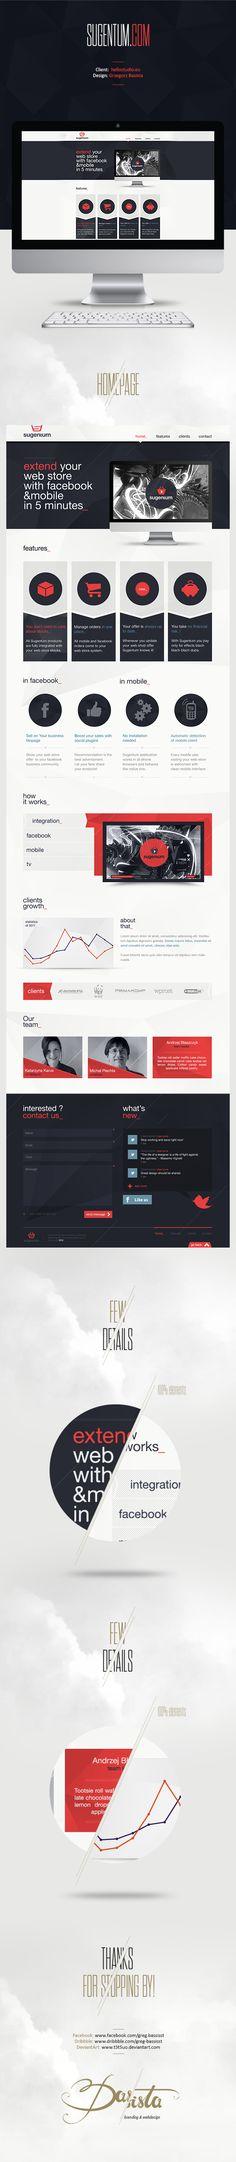 darista | #webdesign #it #web #design #layout #userinterface #website #webdesign < repinned by www.BlickeDeeler.de | Take a look at www.WebsiteDesign-Hamburg.de